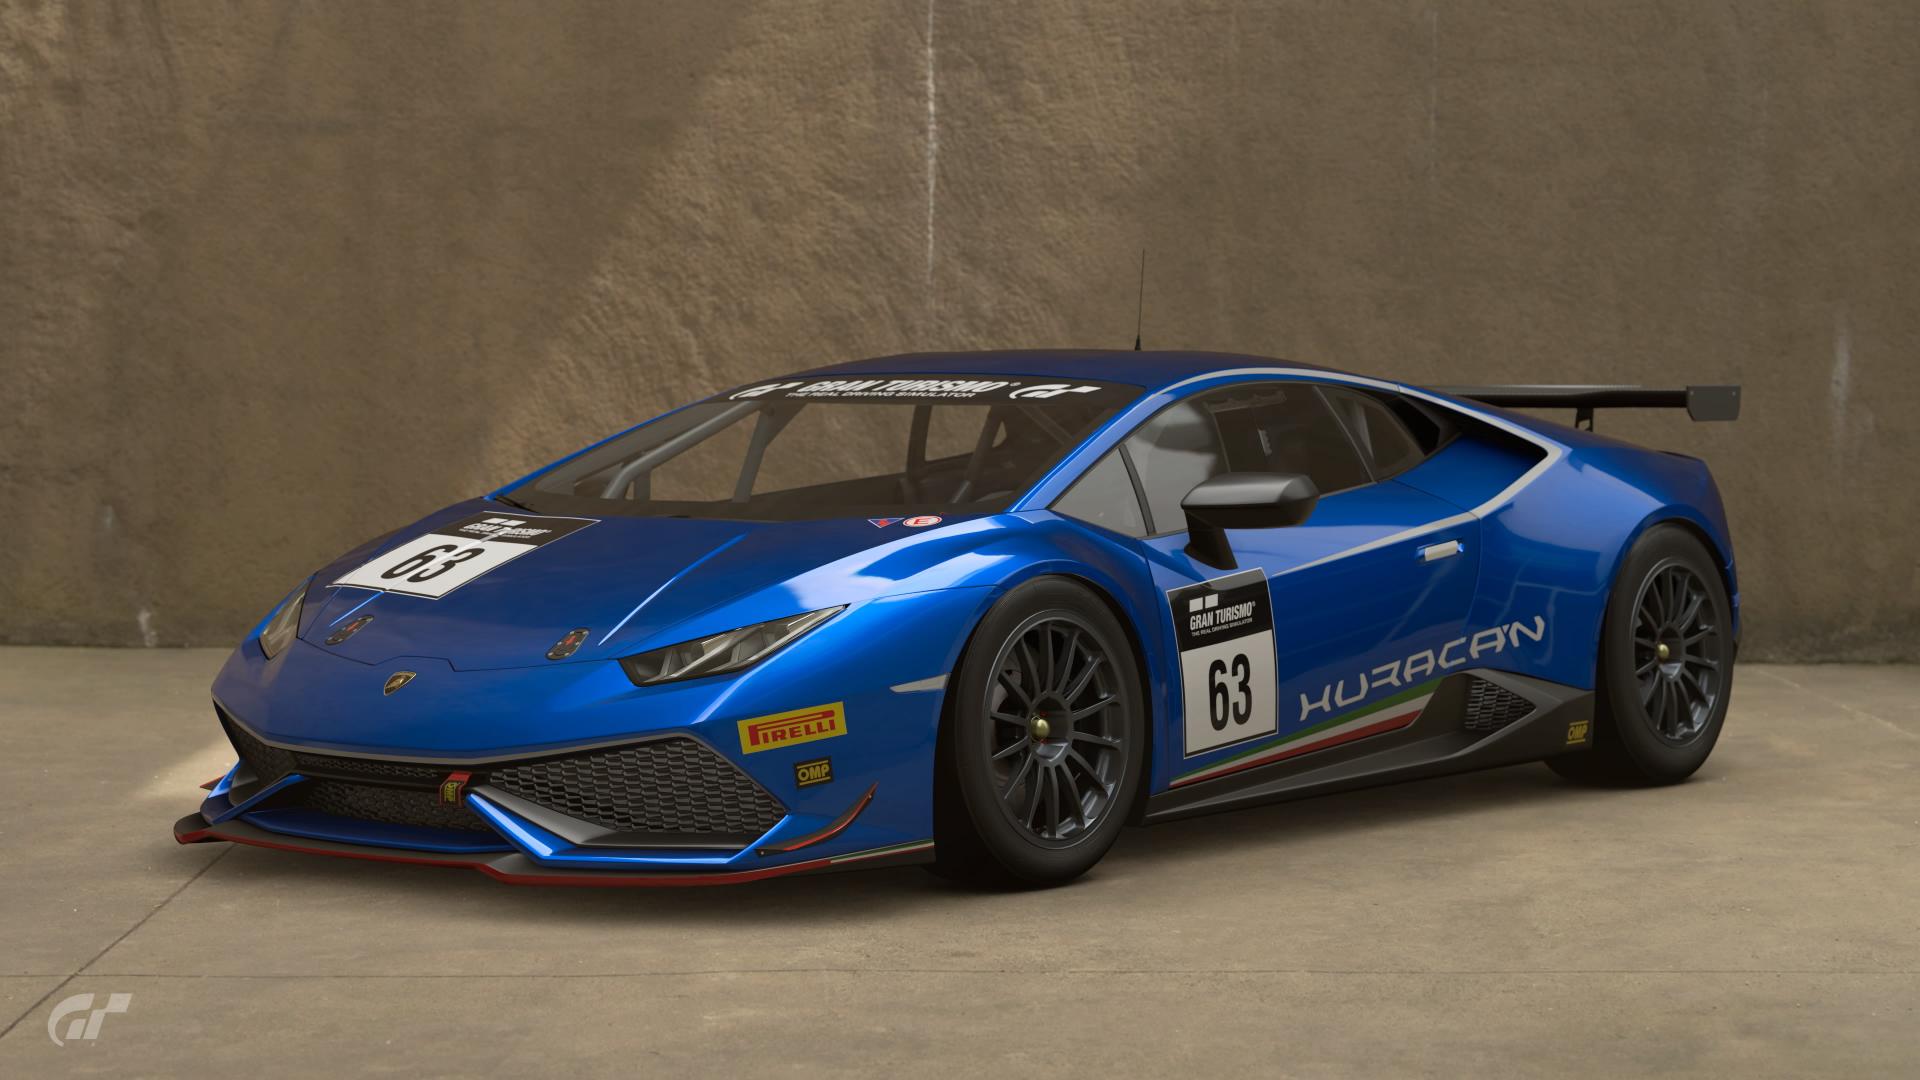 Laguna Seca Raceway >> Lamborghini Huracán Gr.4 | Gran Turismo Wiki | Fandom